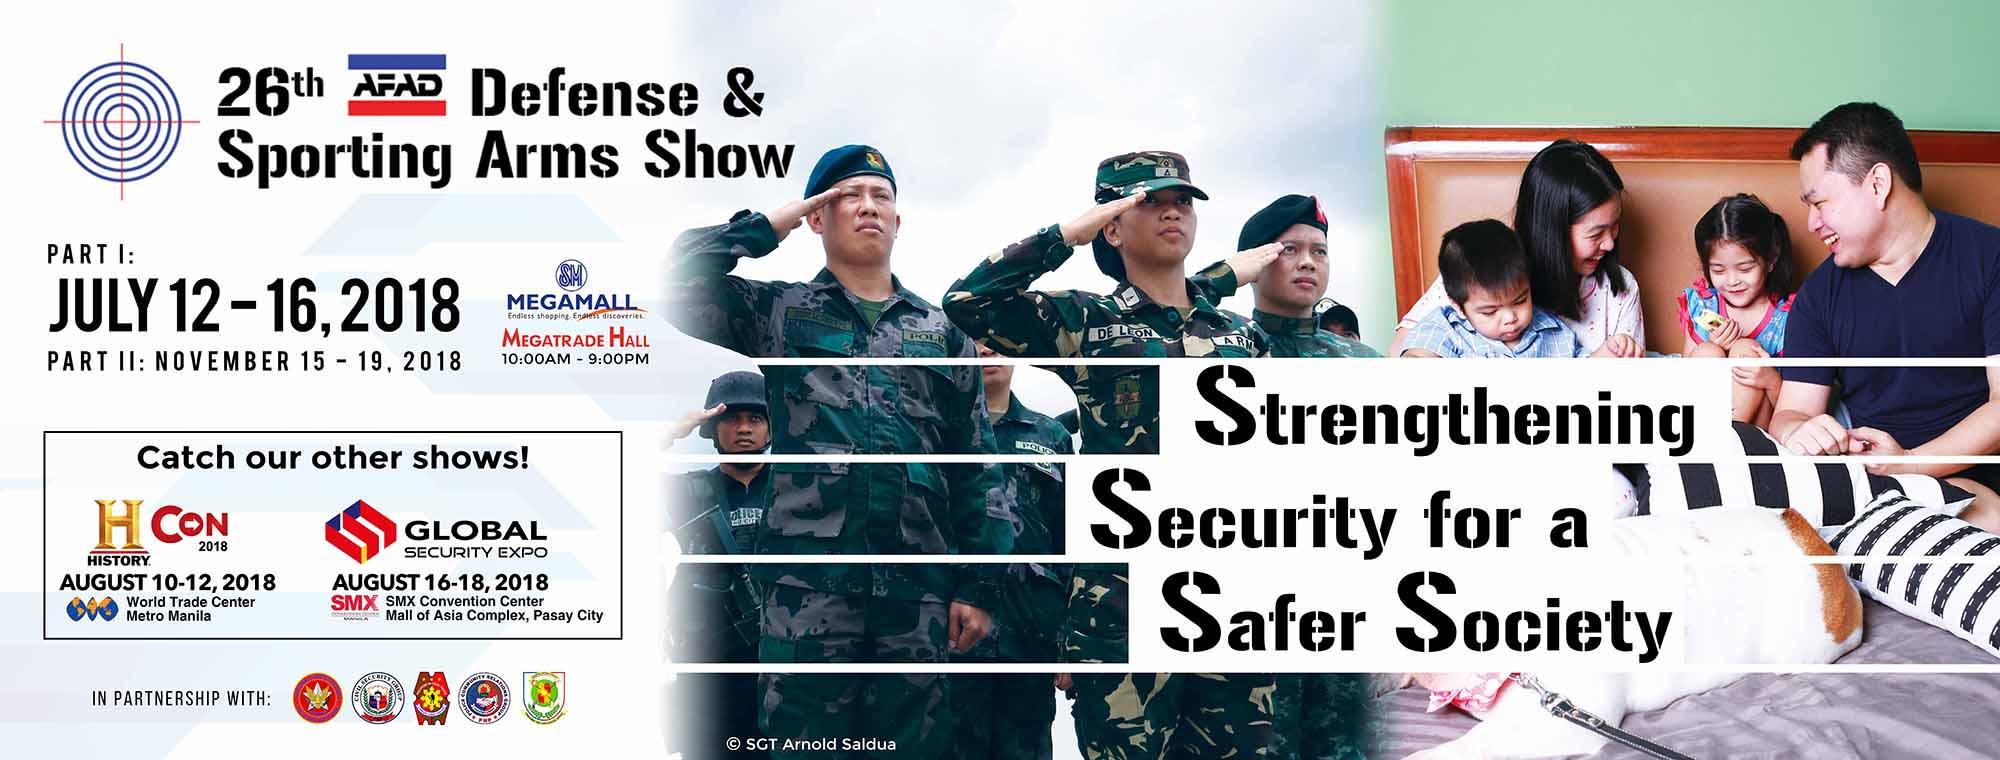 Strengthening Security for Safer Society : AFAD DSAS 2018 pt. 1